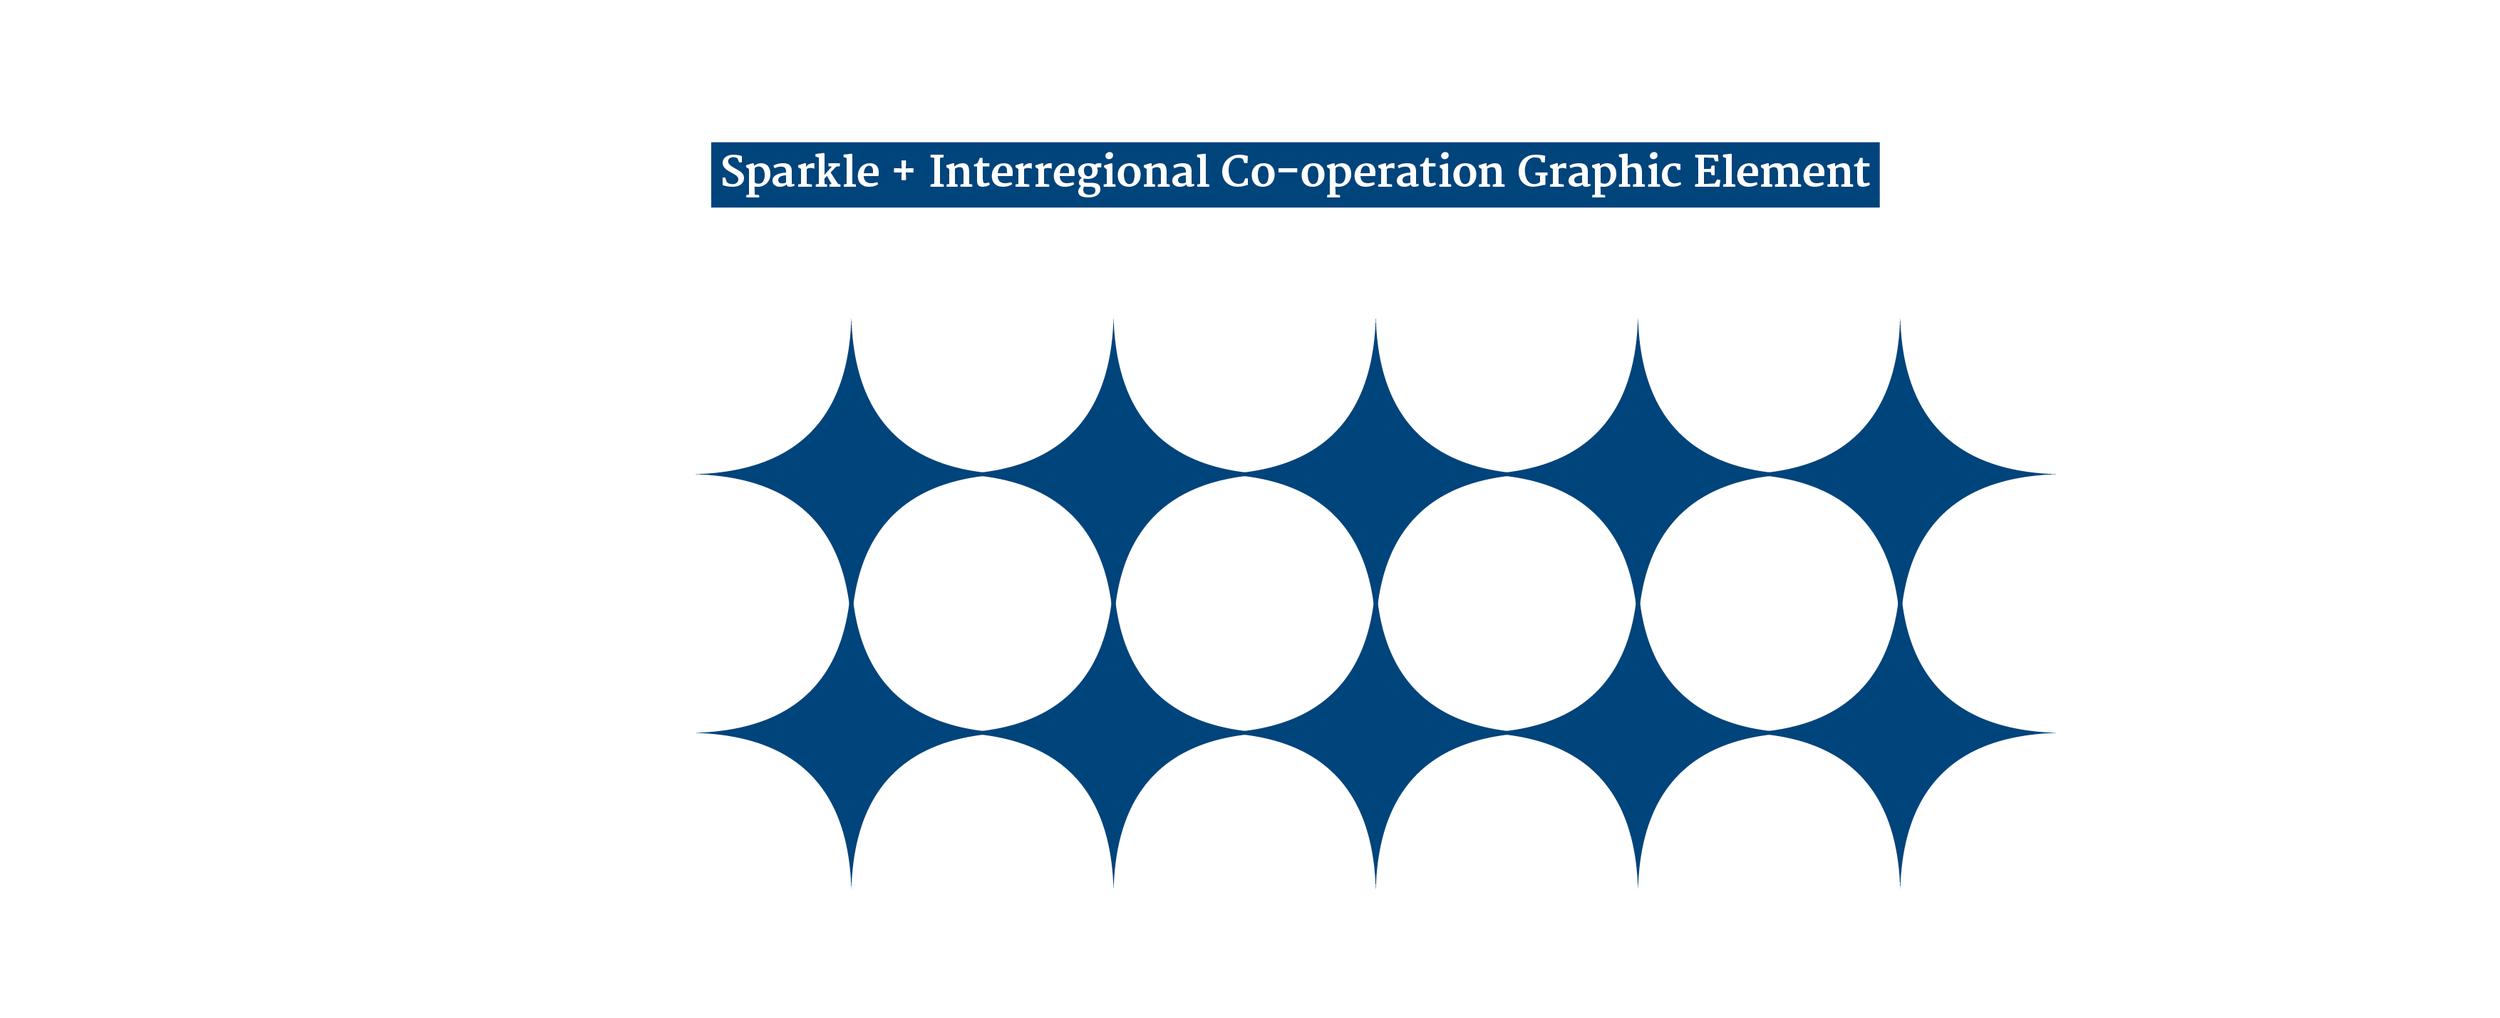 OSCE_Partnership_Logo_Graphic_Charter_3110167.png